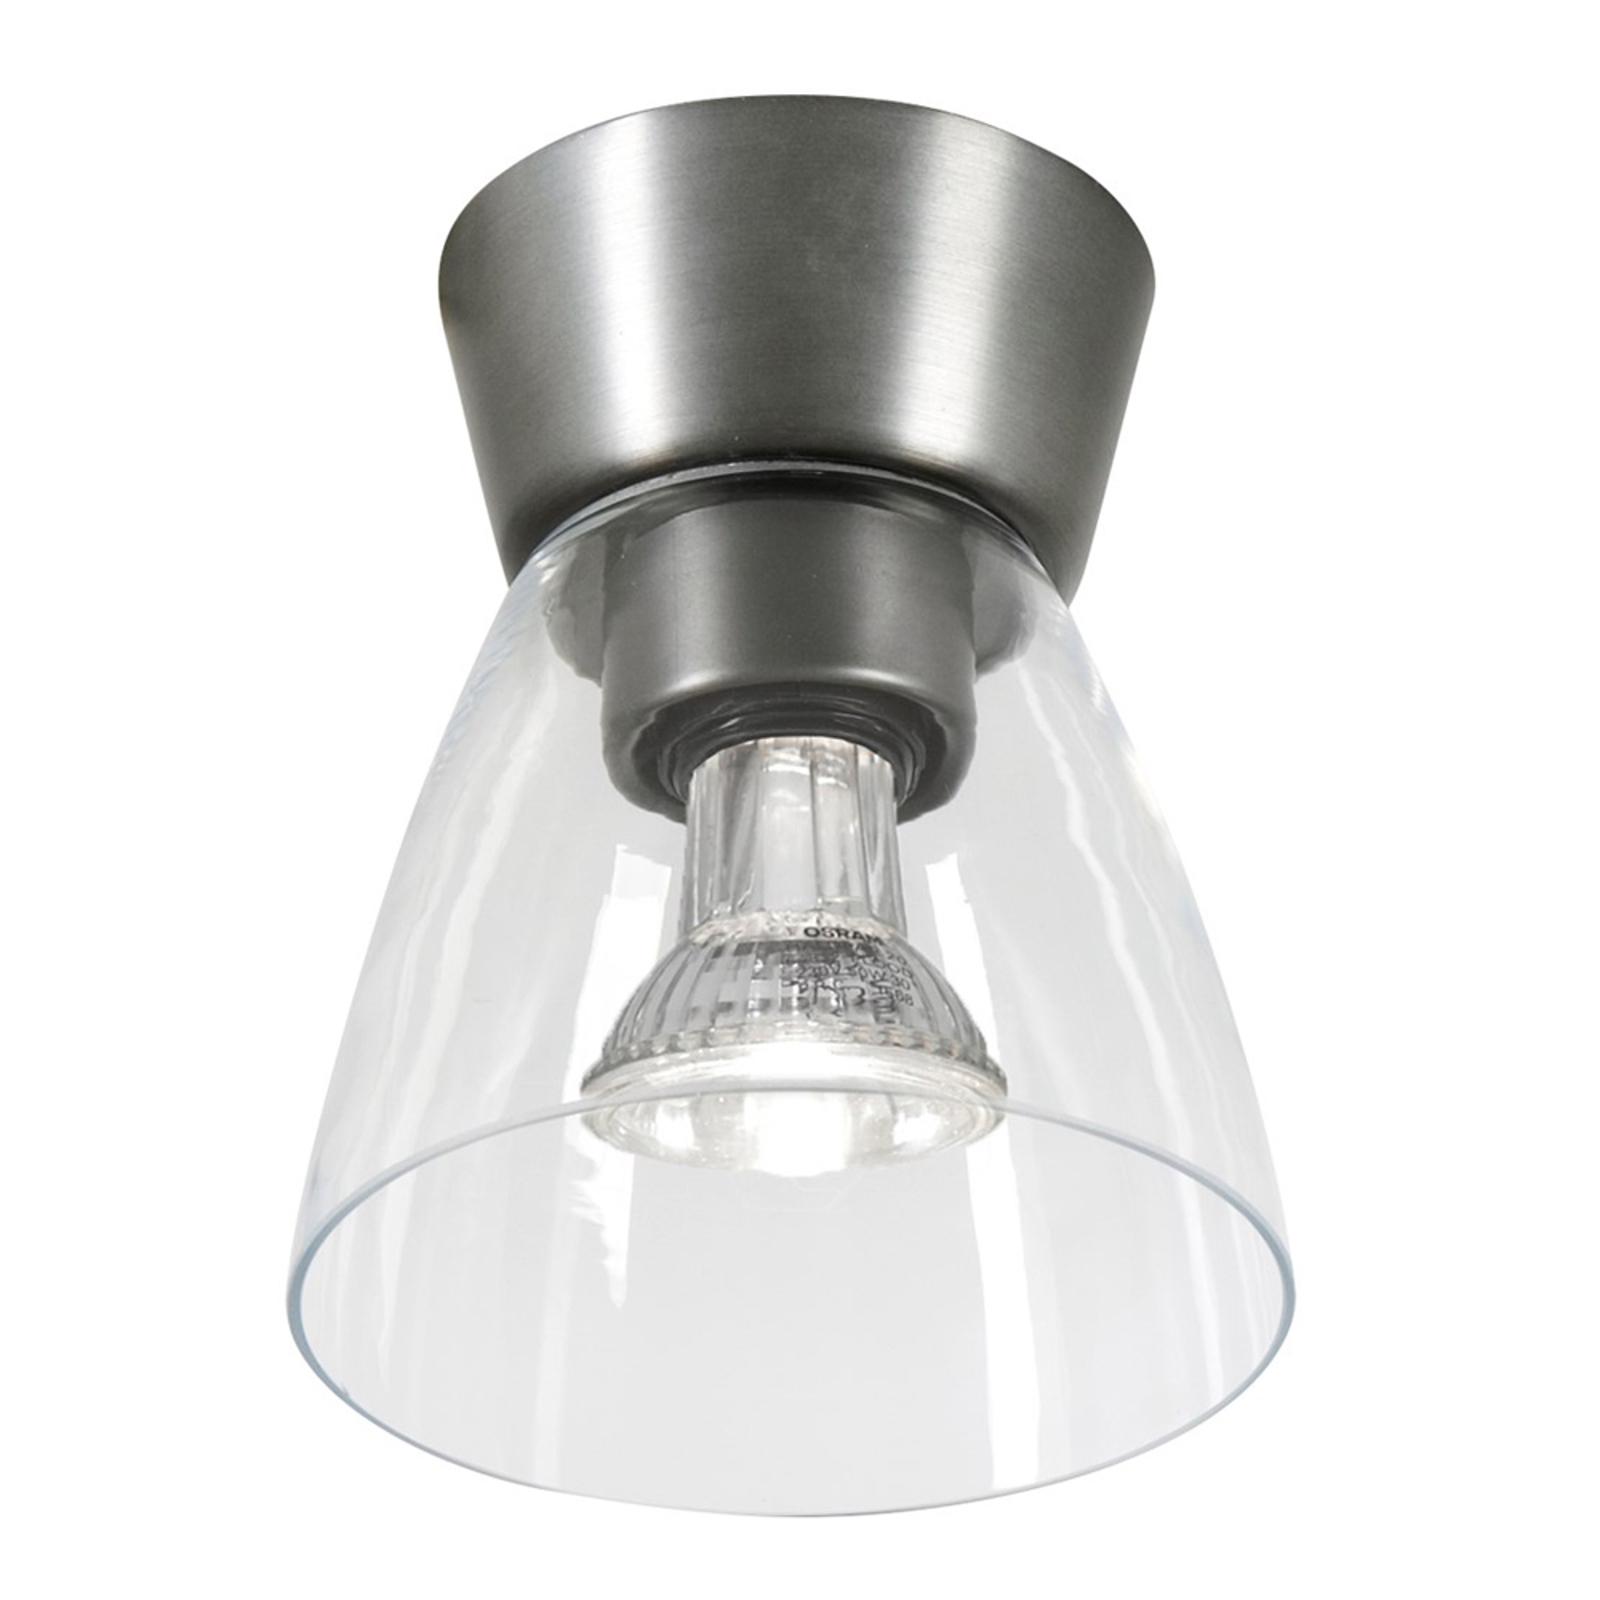 LED plafondlamp Bizzo helder glasoxide grijs